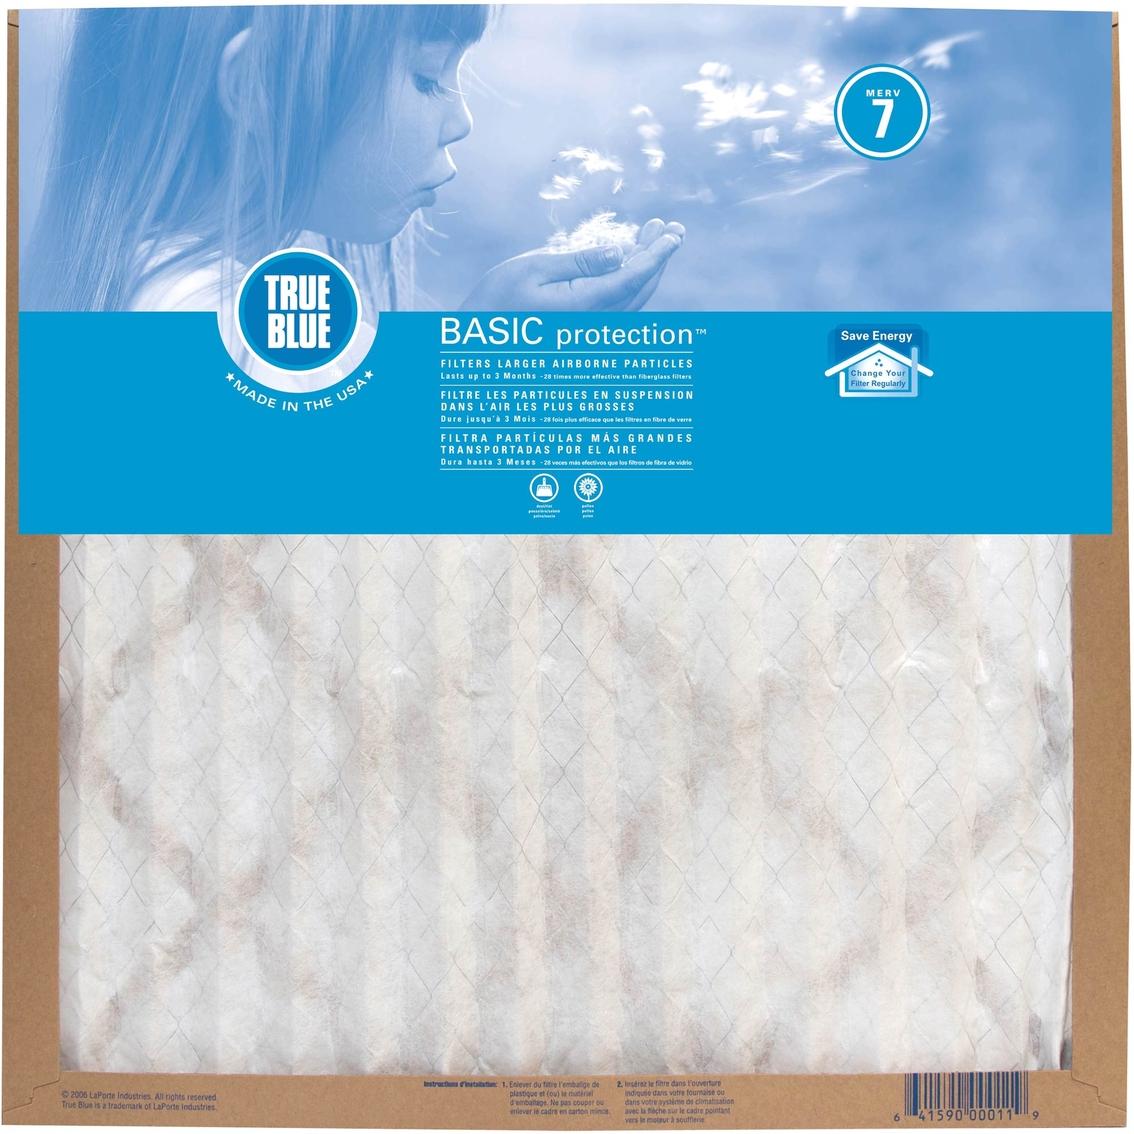 Protect plus true blue basic merv 7 pleated 90 day air filter 20 x protect plus true blue basic merv 7 pleated 90 day air filter 20 x 20 x 1 malvernweather Gallery